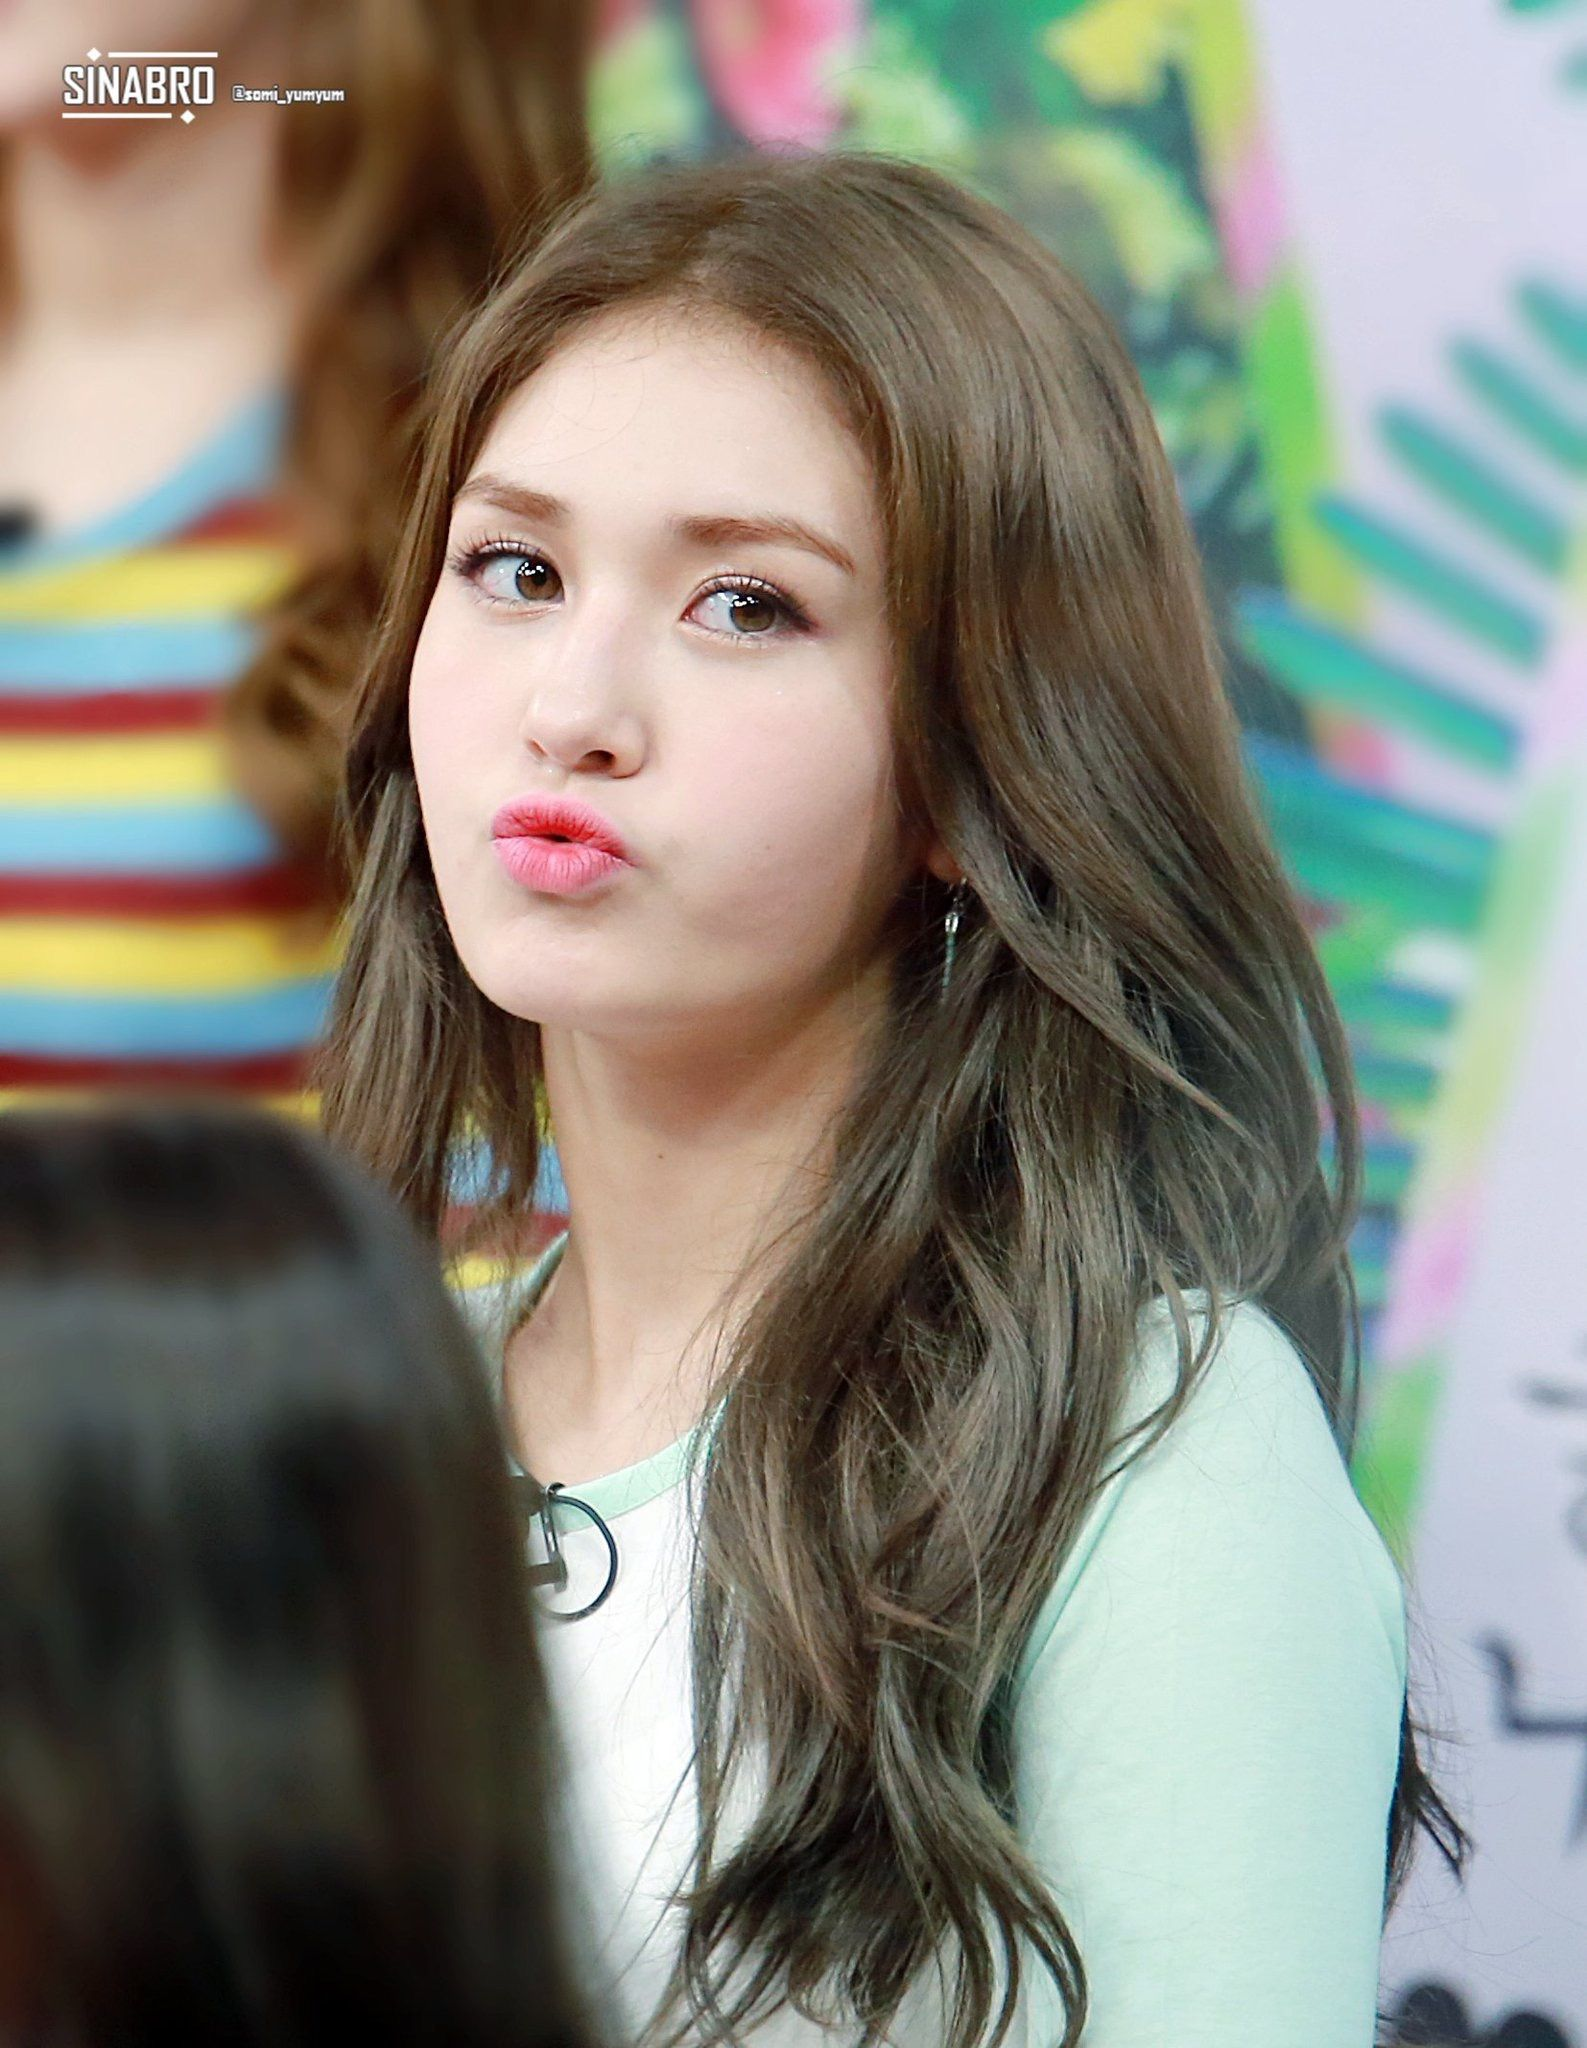 jeon somi | somi | pinterest | kpop and korean